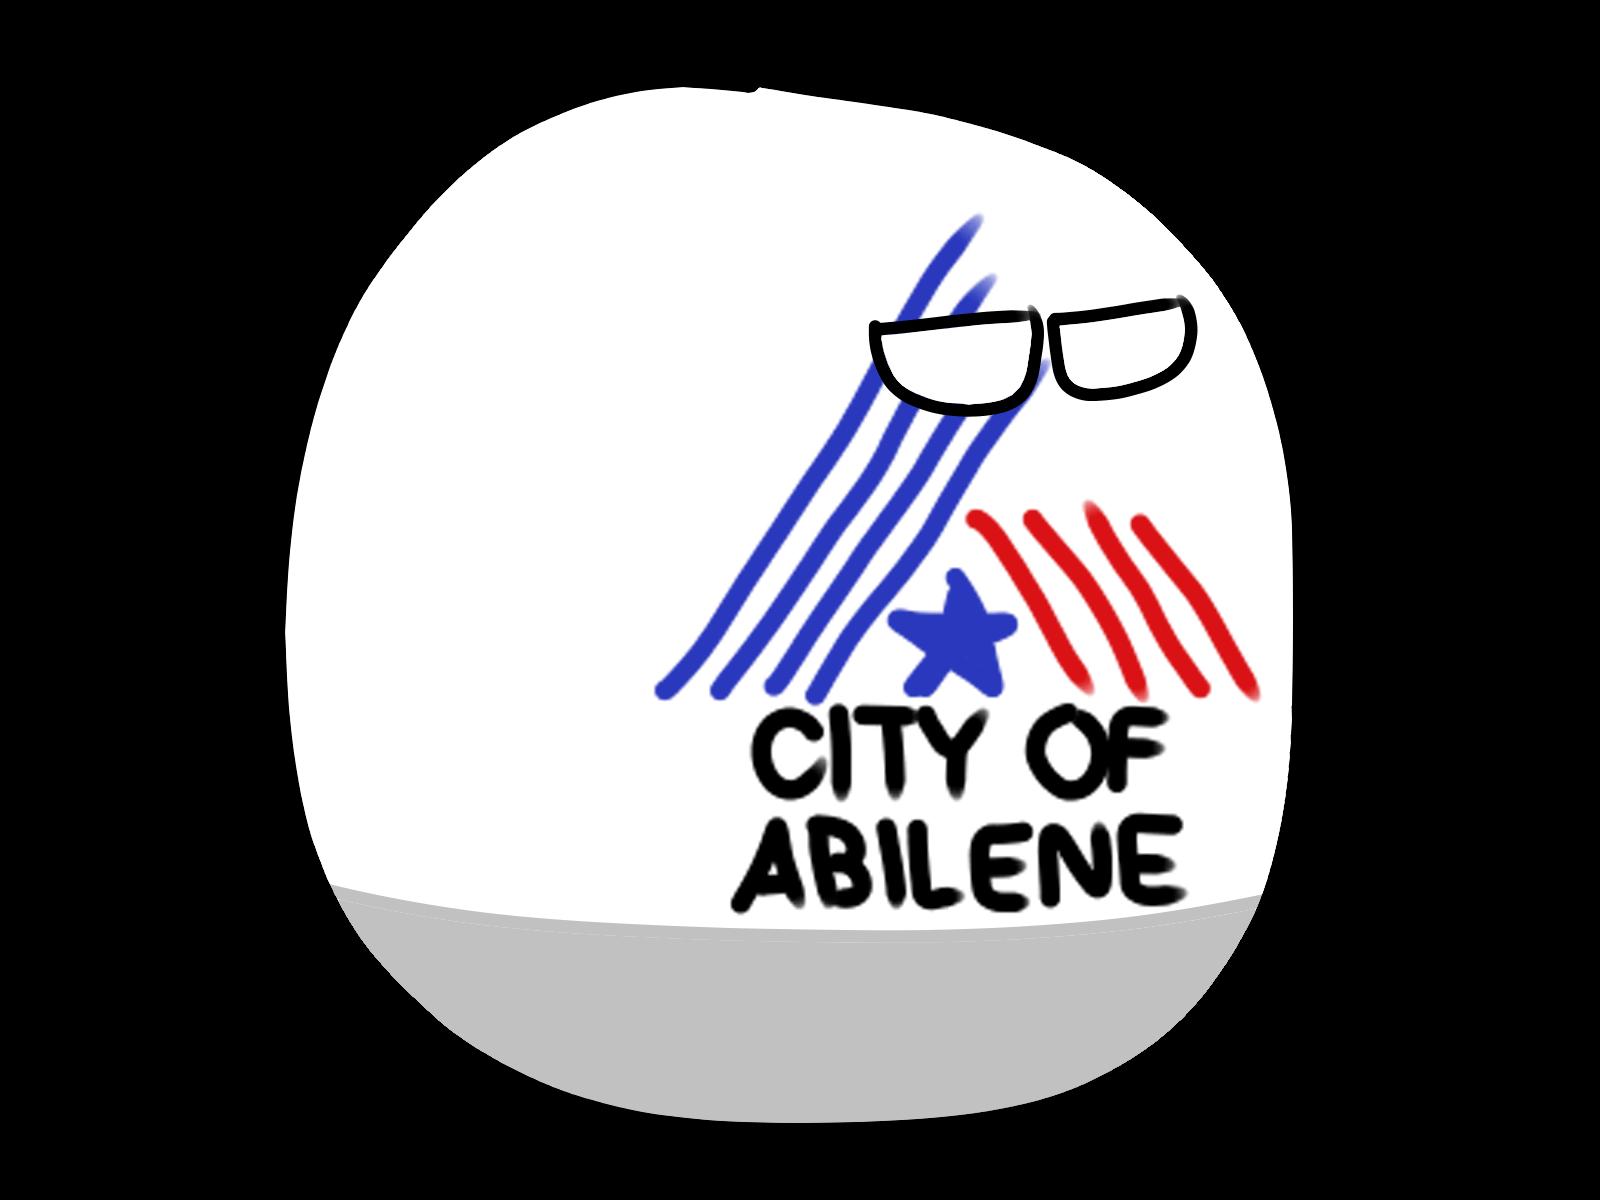 Abileneball